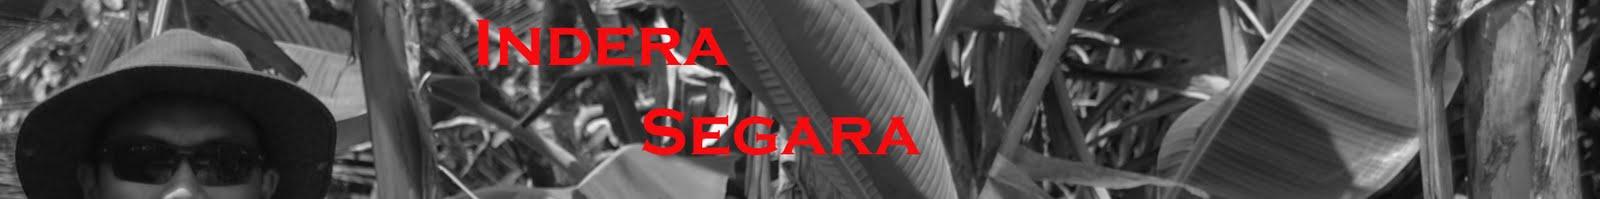 Indera Segara